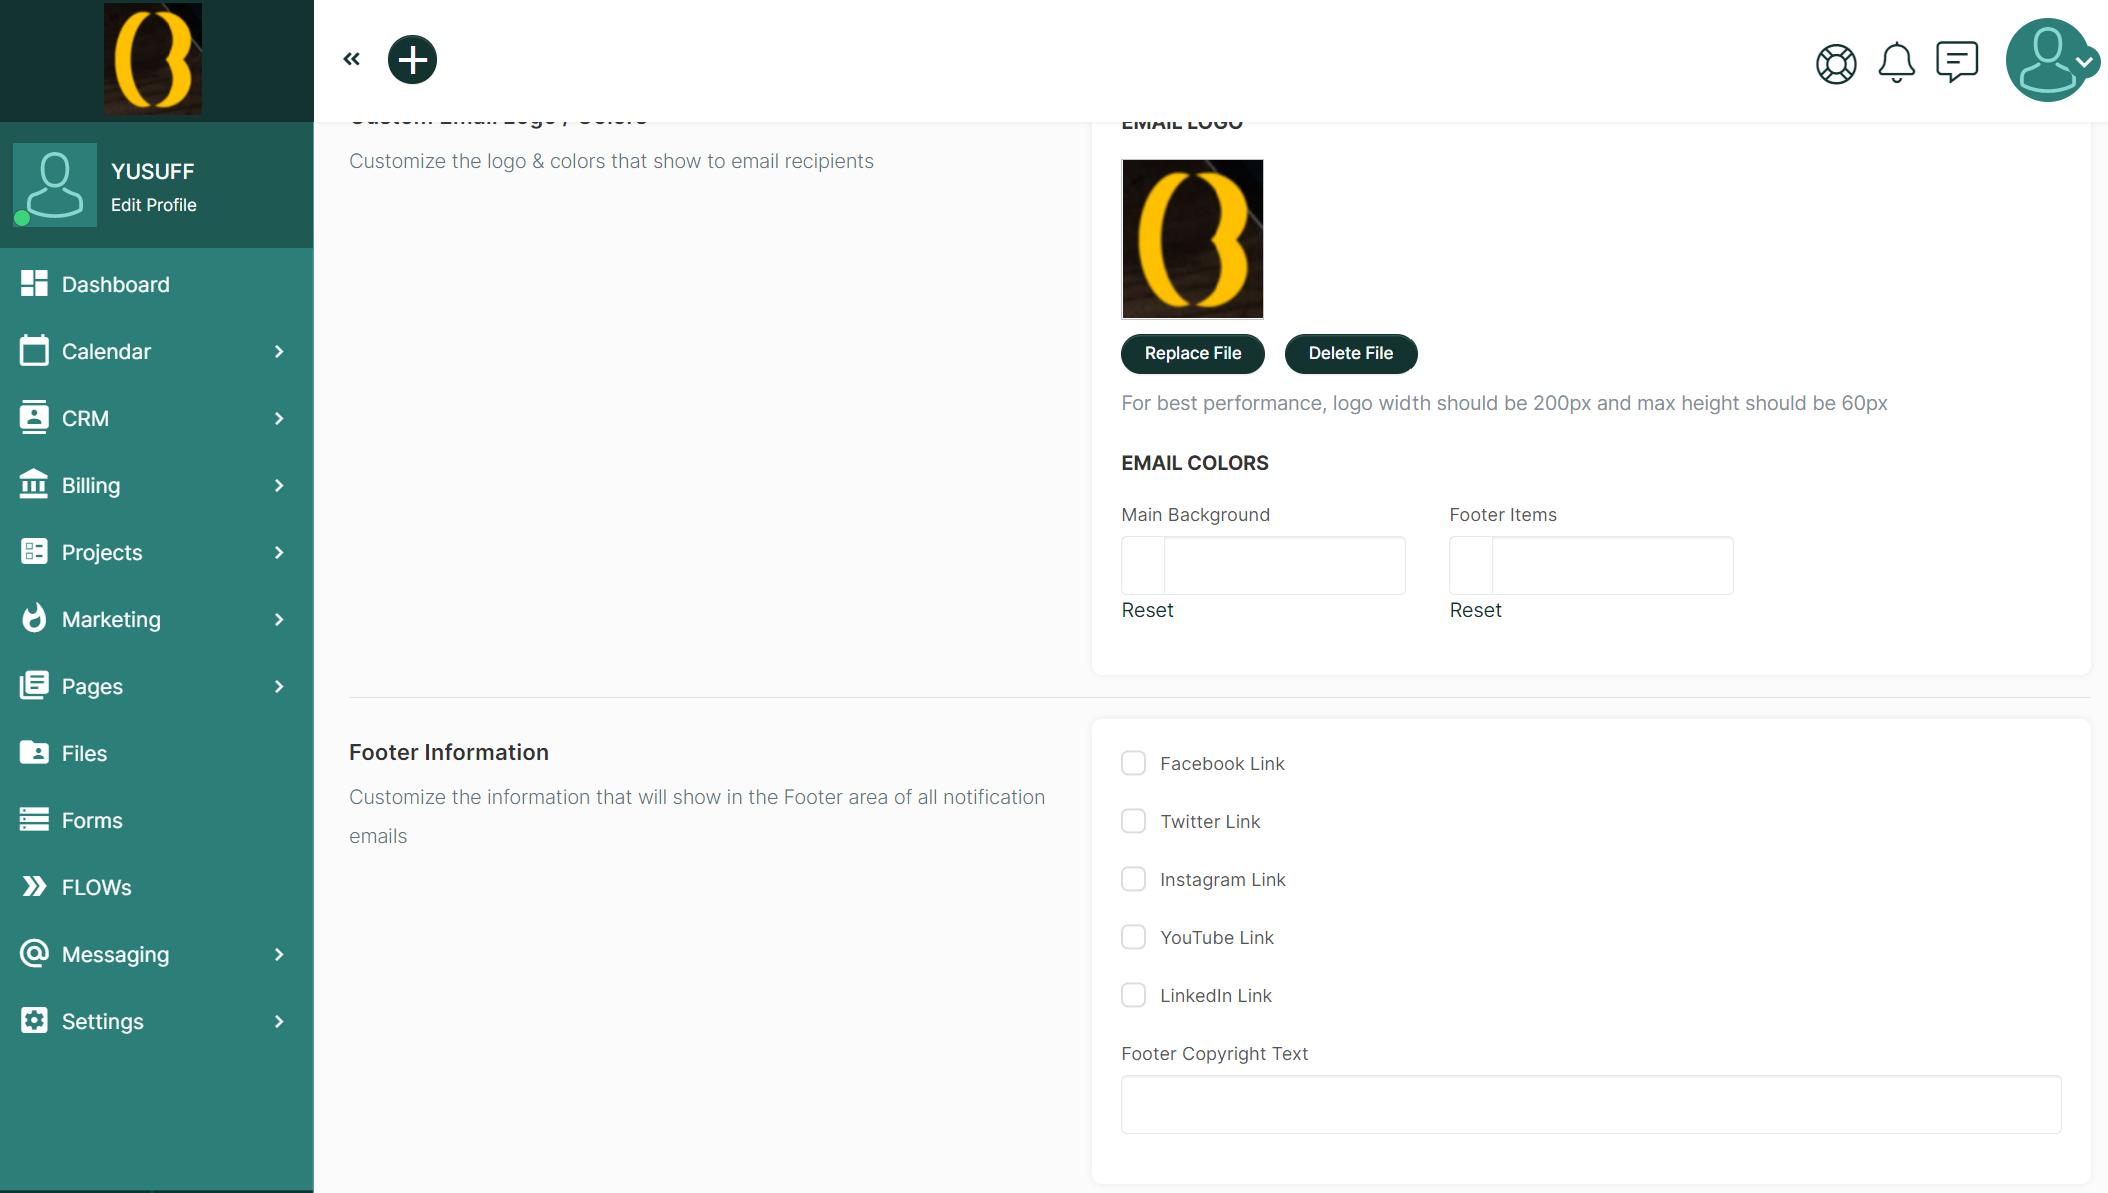 SuiteDash - Email Branding & Customization